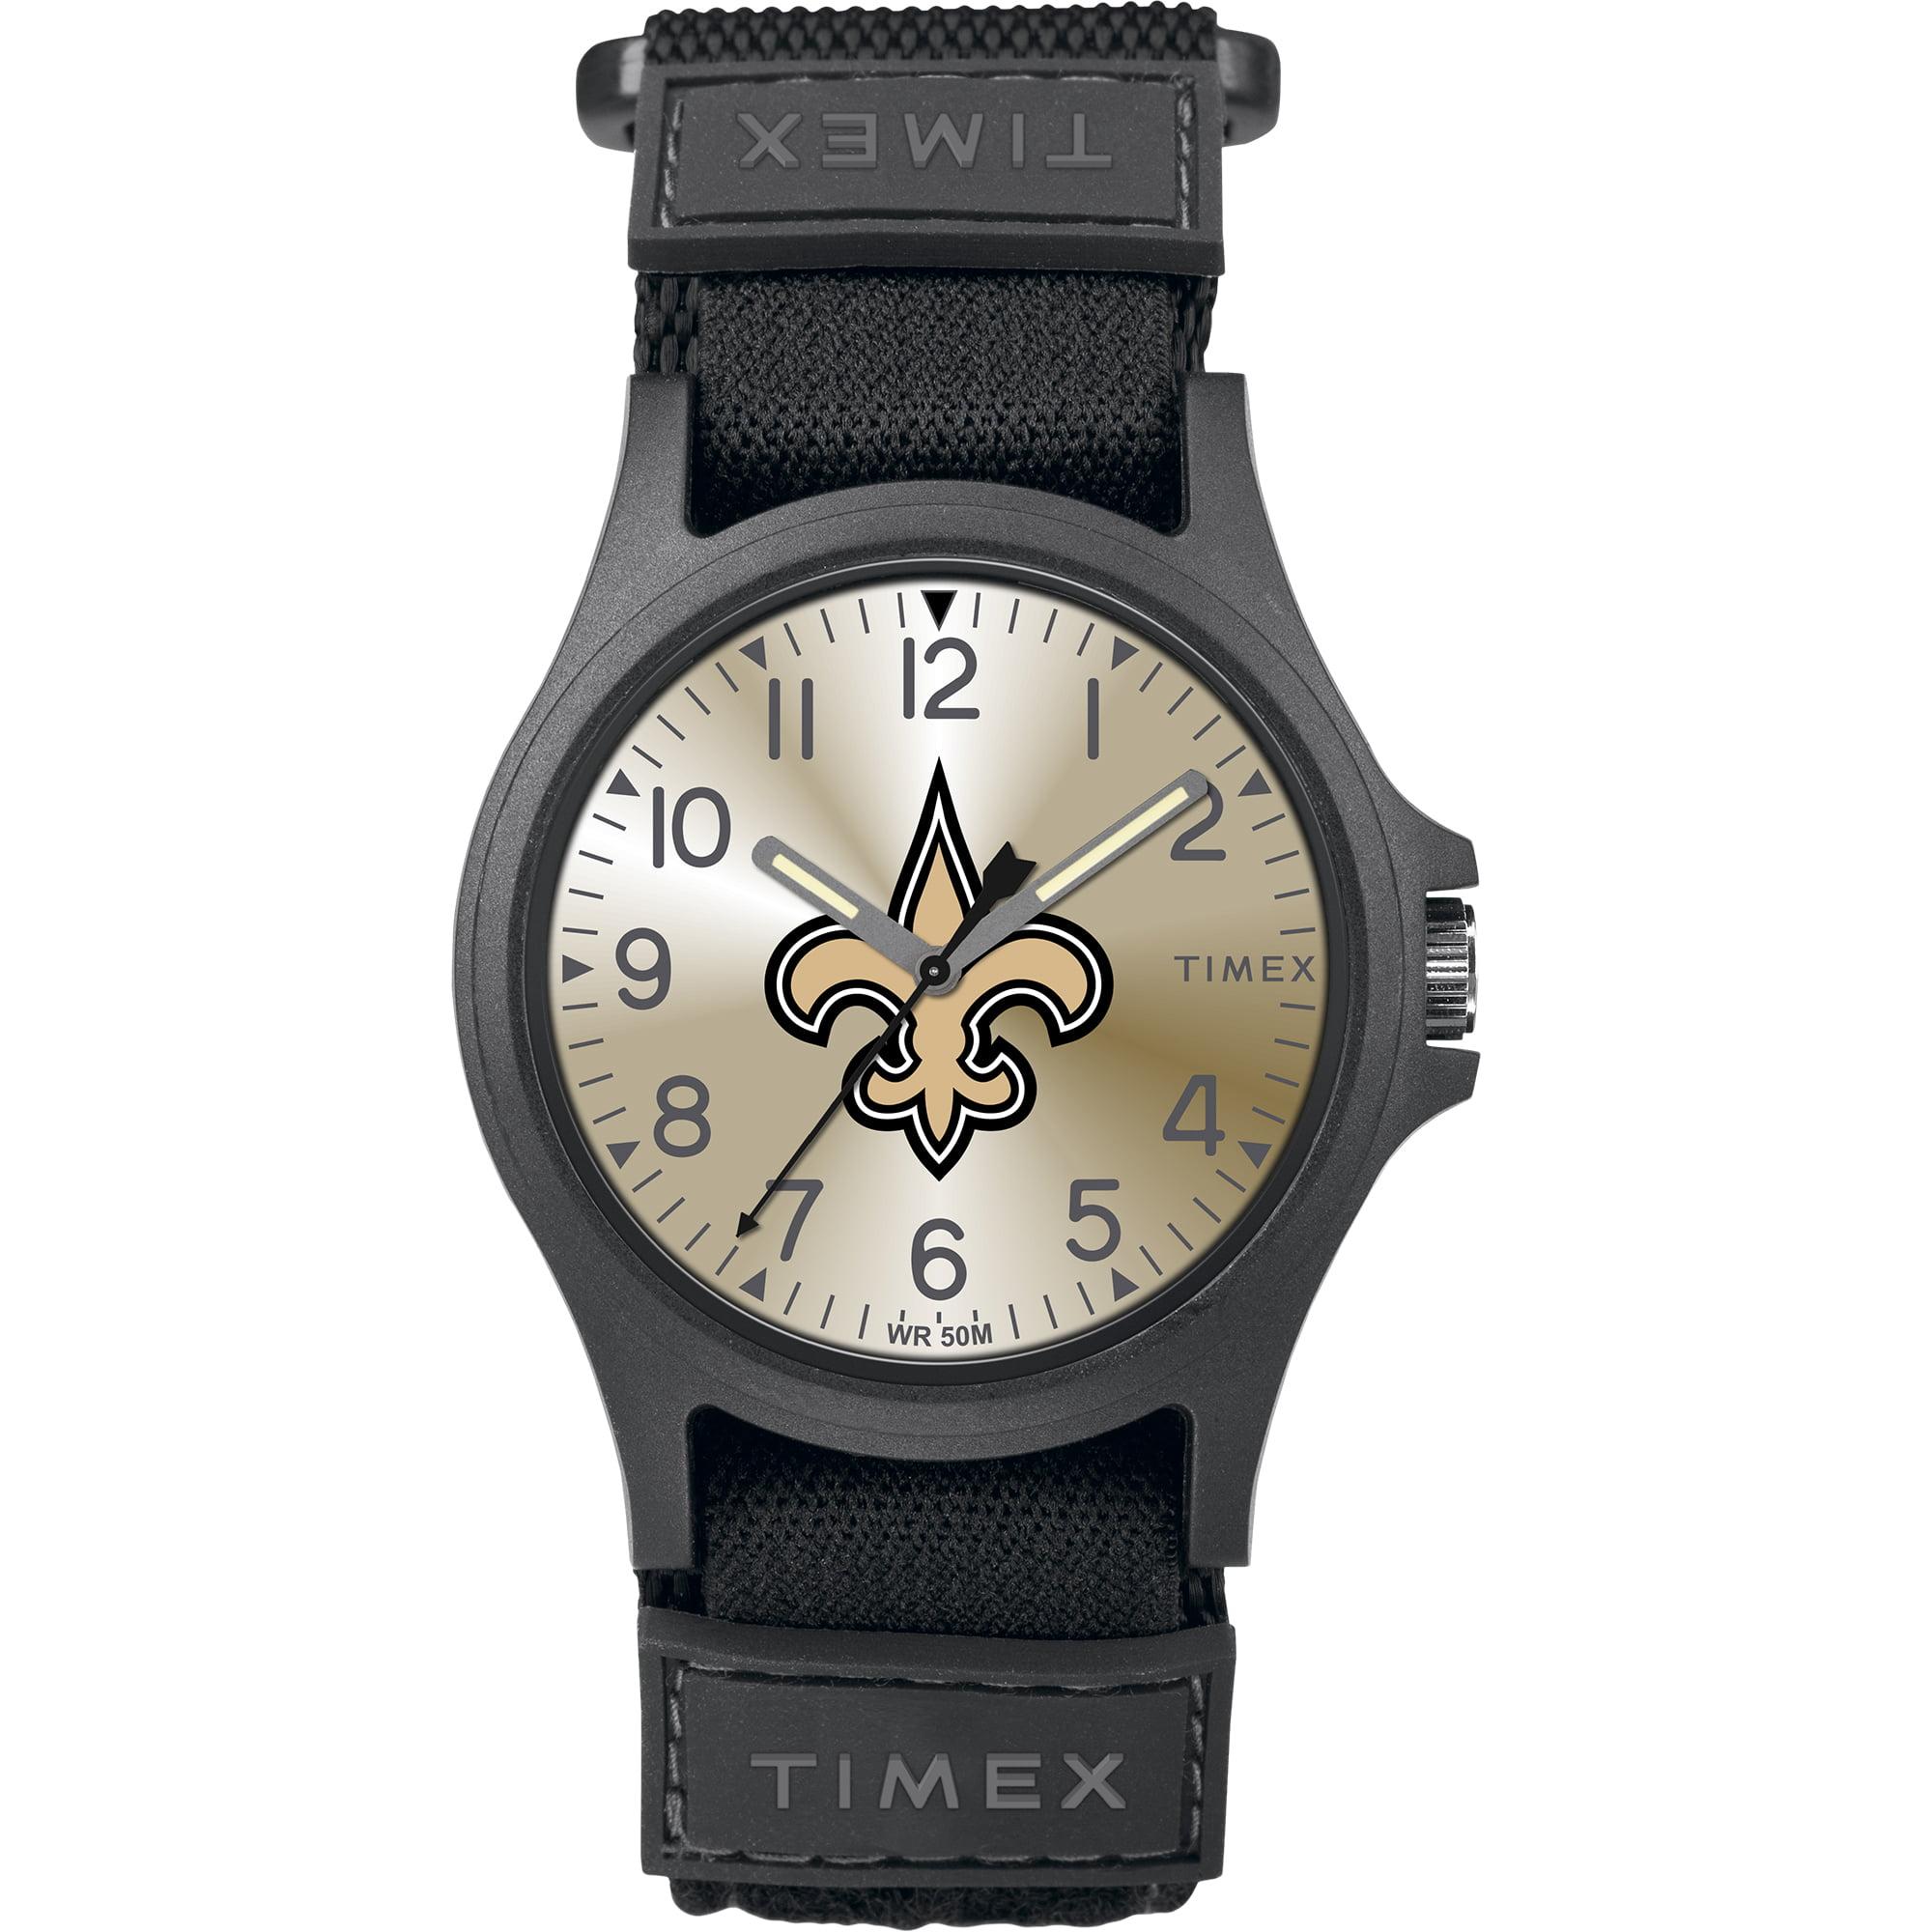 Timex - NFL Tribute Collection Pride Men's Watch, New Orleans Saints